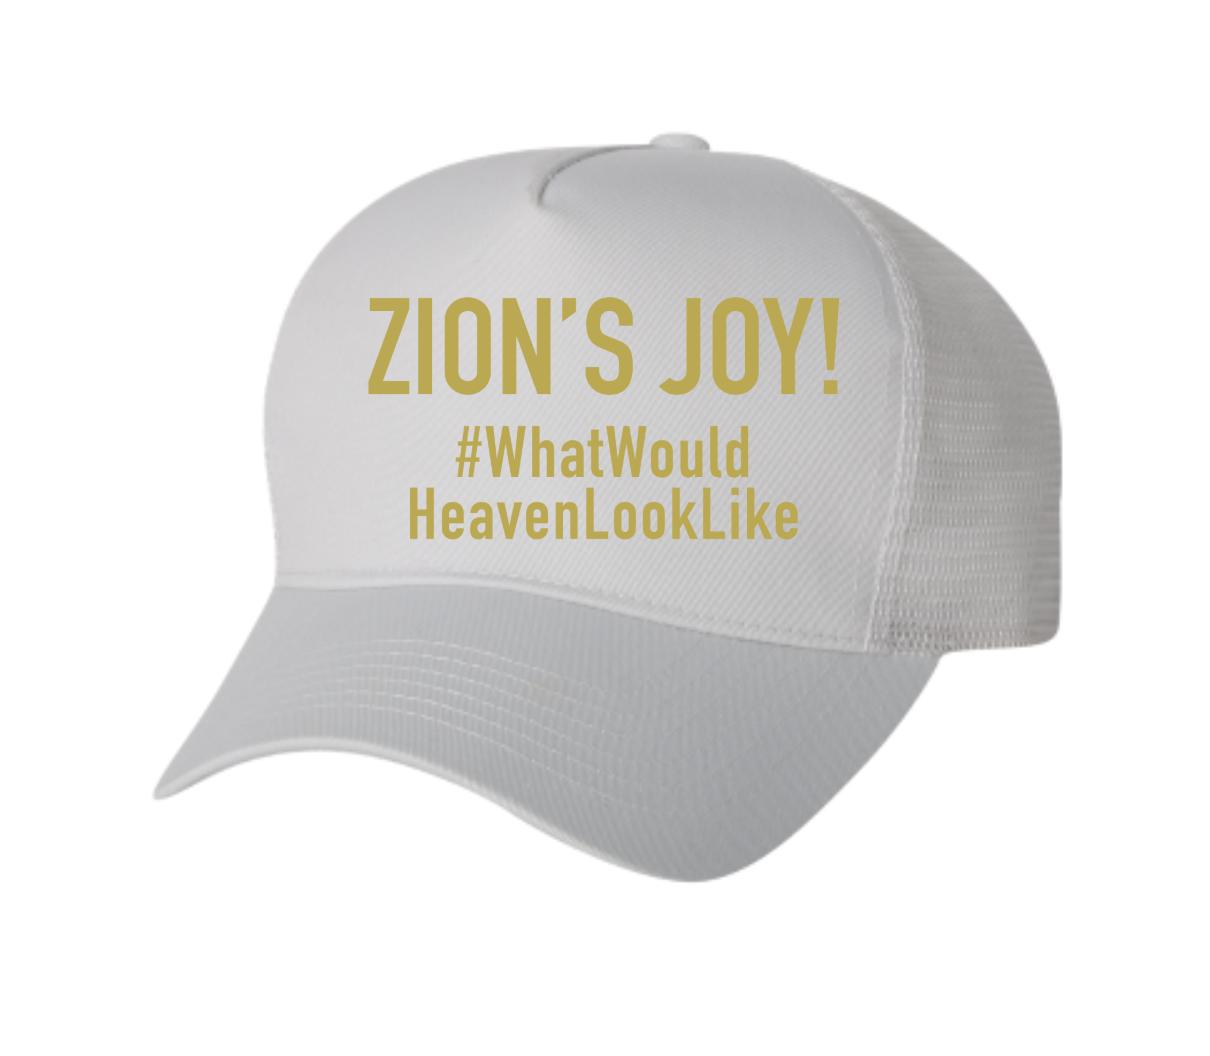 #WhatWouldHeavenLookLike Hat (White) (COMING SOON)